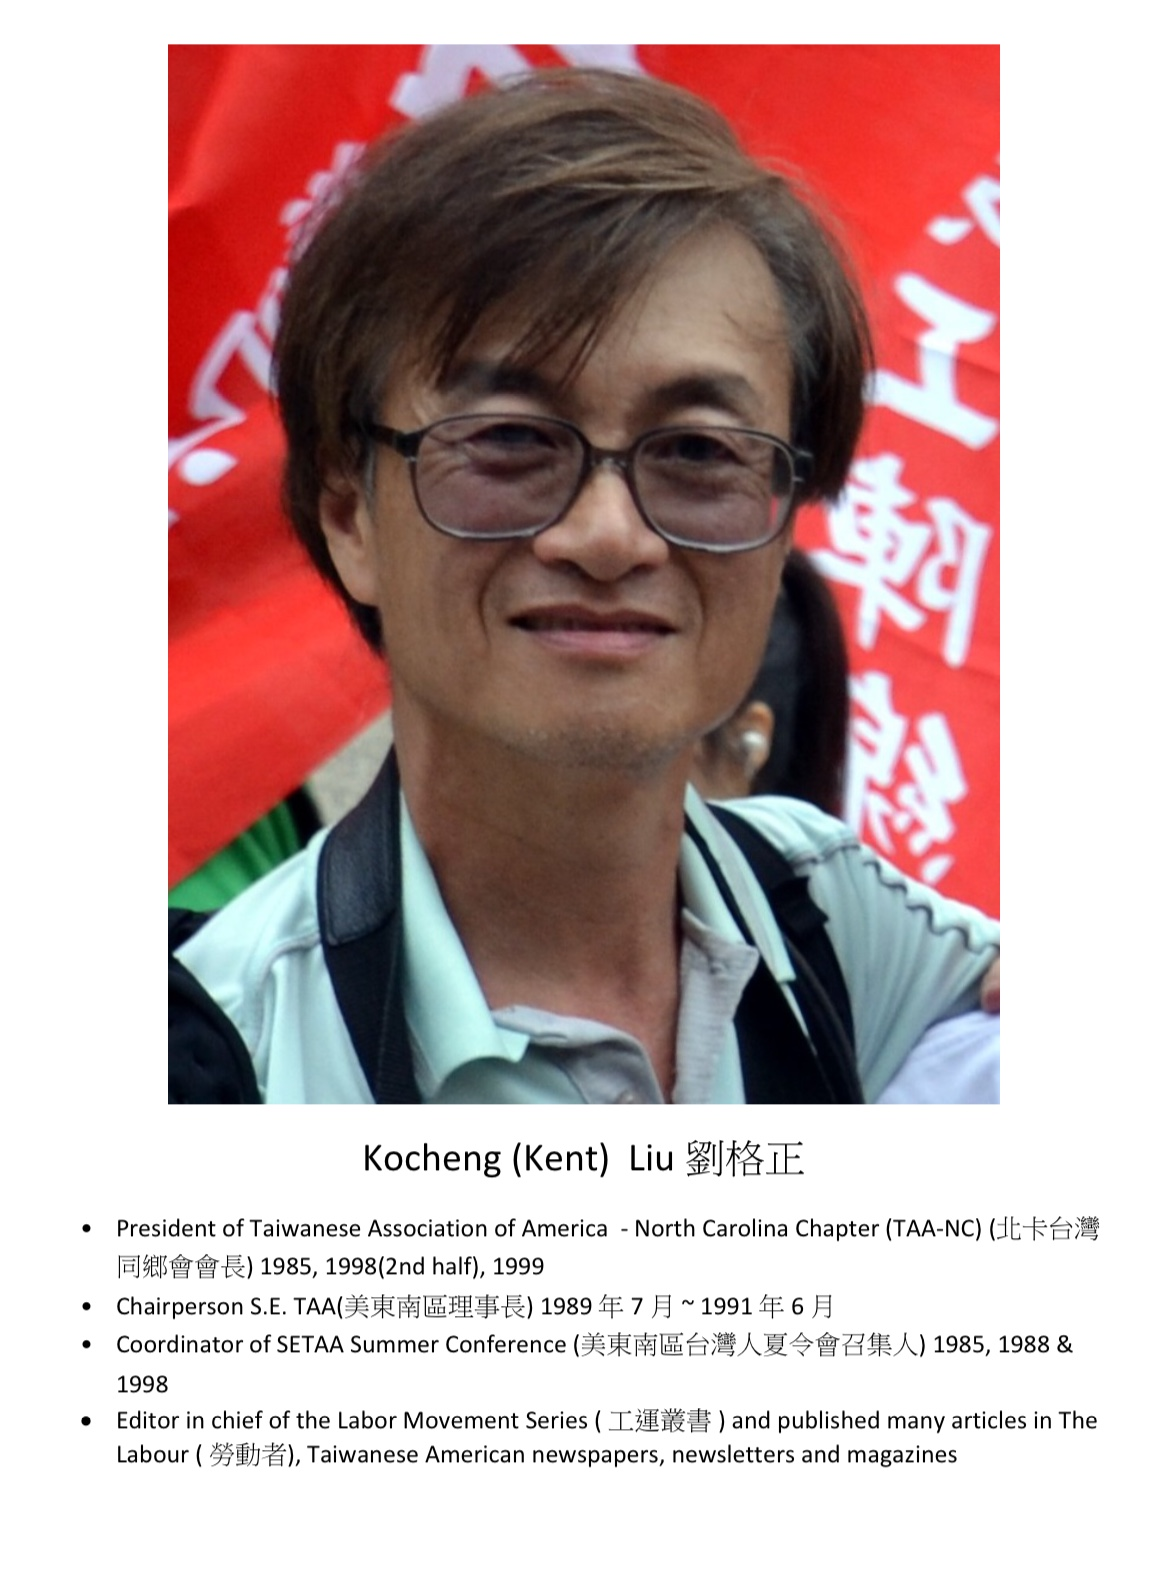 97. Kocheng (Kent) Liu 劉格正